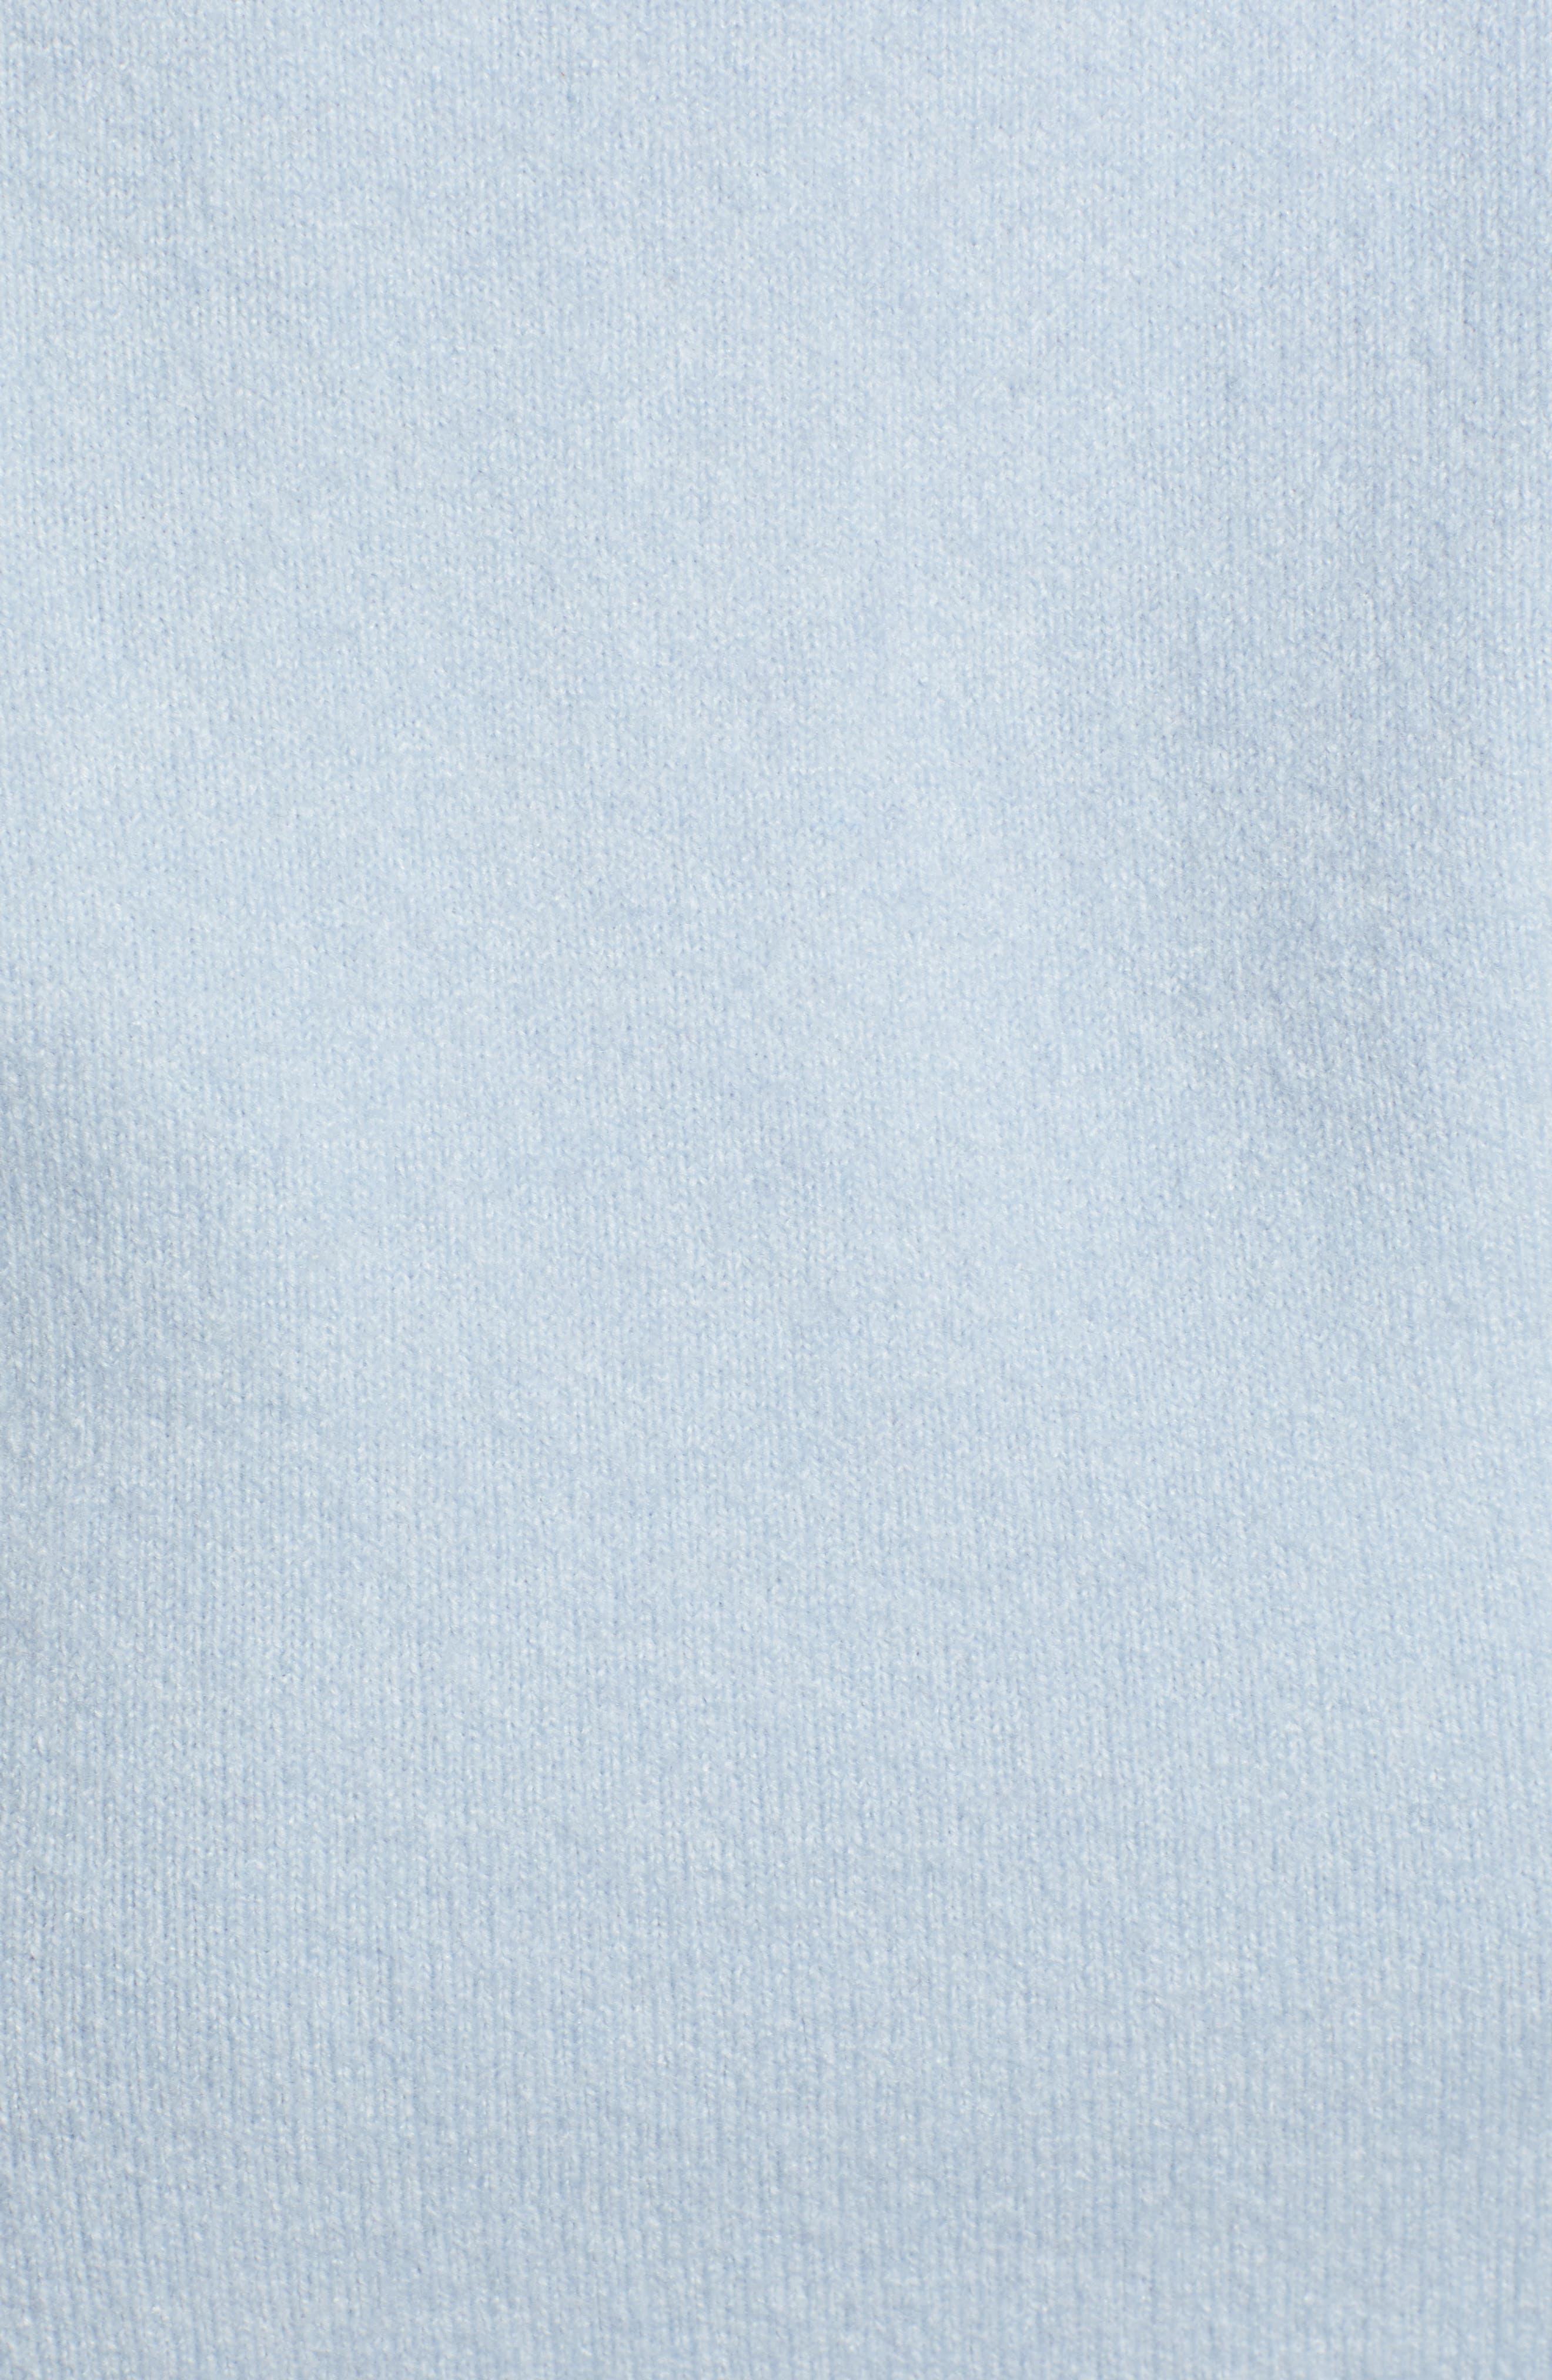 Convertible Neck Sweater,                             Alternate thumbnail 5, color,                             BLUE FOG